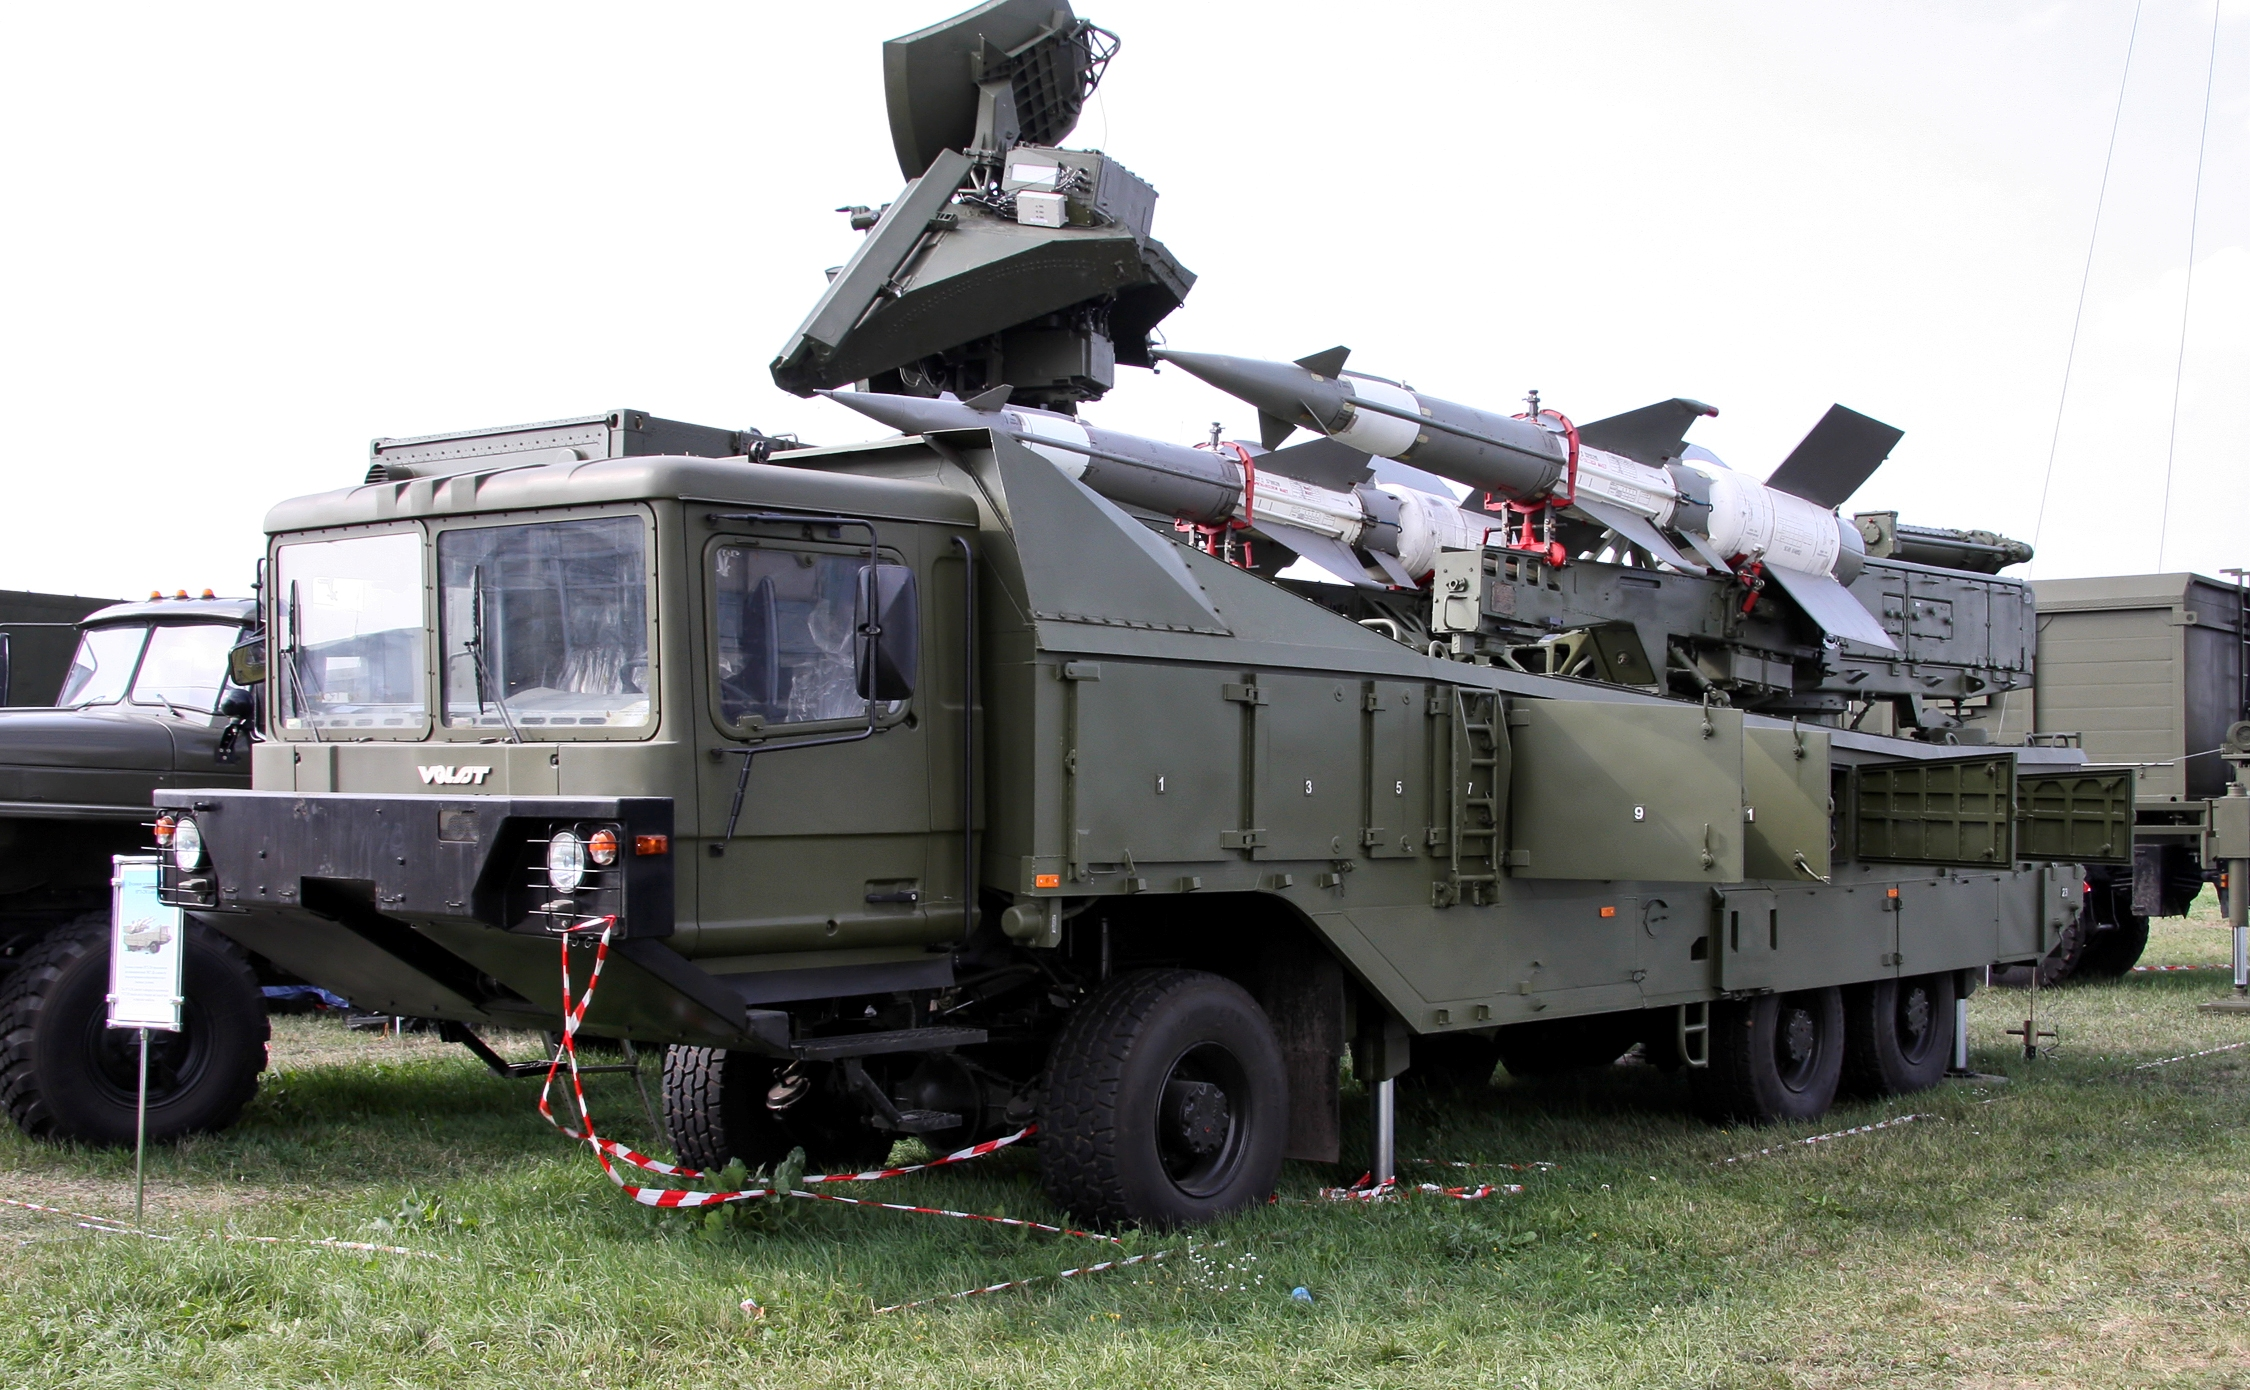 EJÉRCITO BRASILEÑO - Página 16 Pechora-2M_-_missile_launcher_2